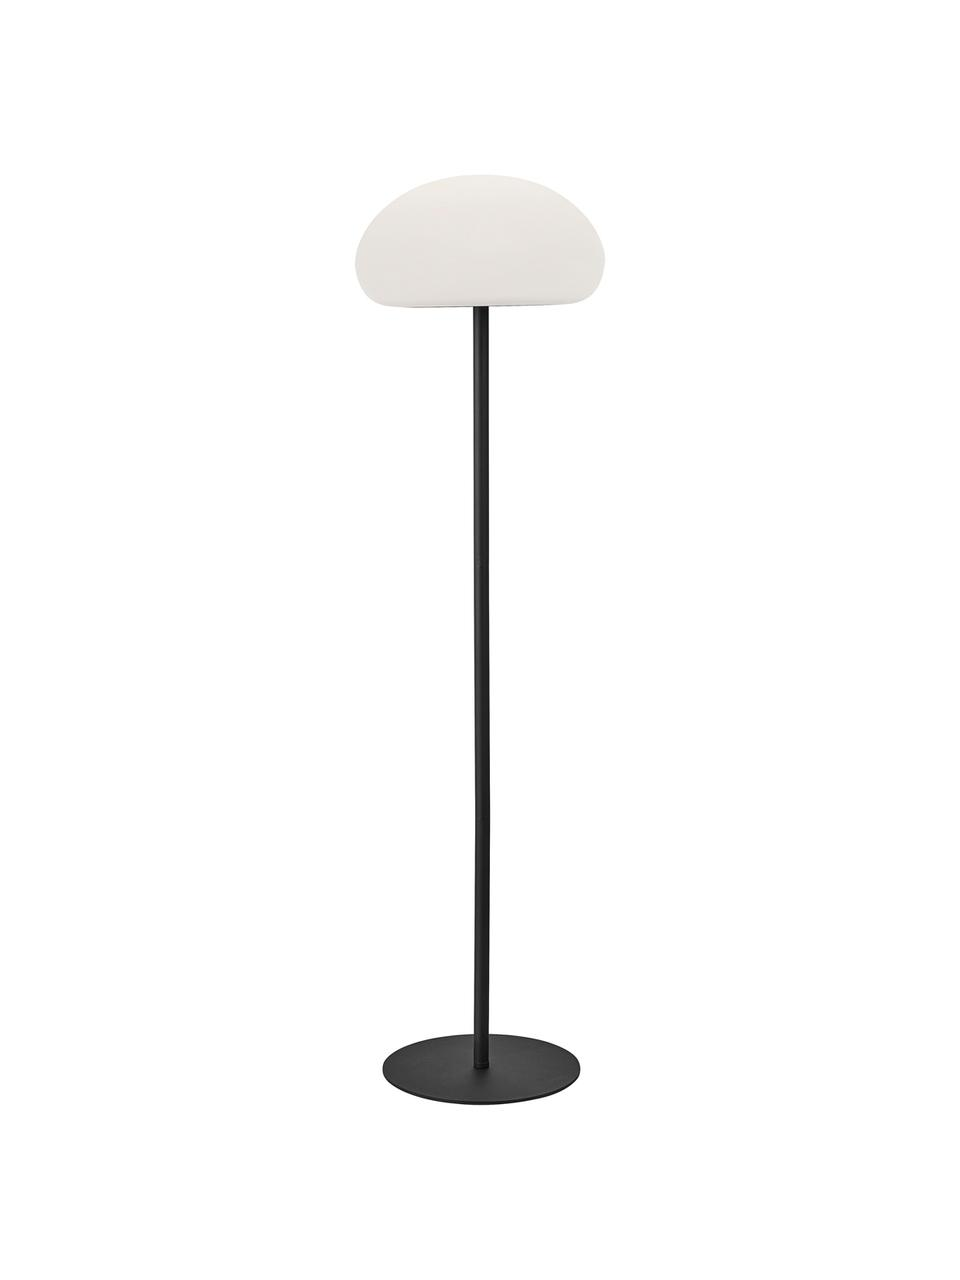 Lampada da terra dimmerabile da esterno Sponge, Paralume: materiale sintetico, Bianco, nero, Ø 34 x Alt. 126 cm